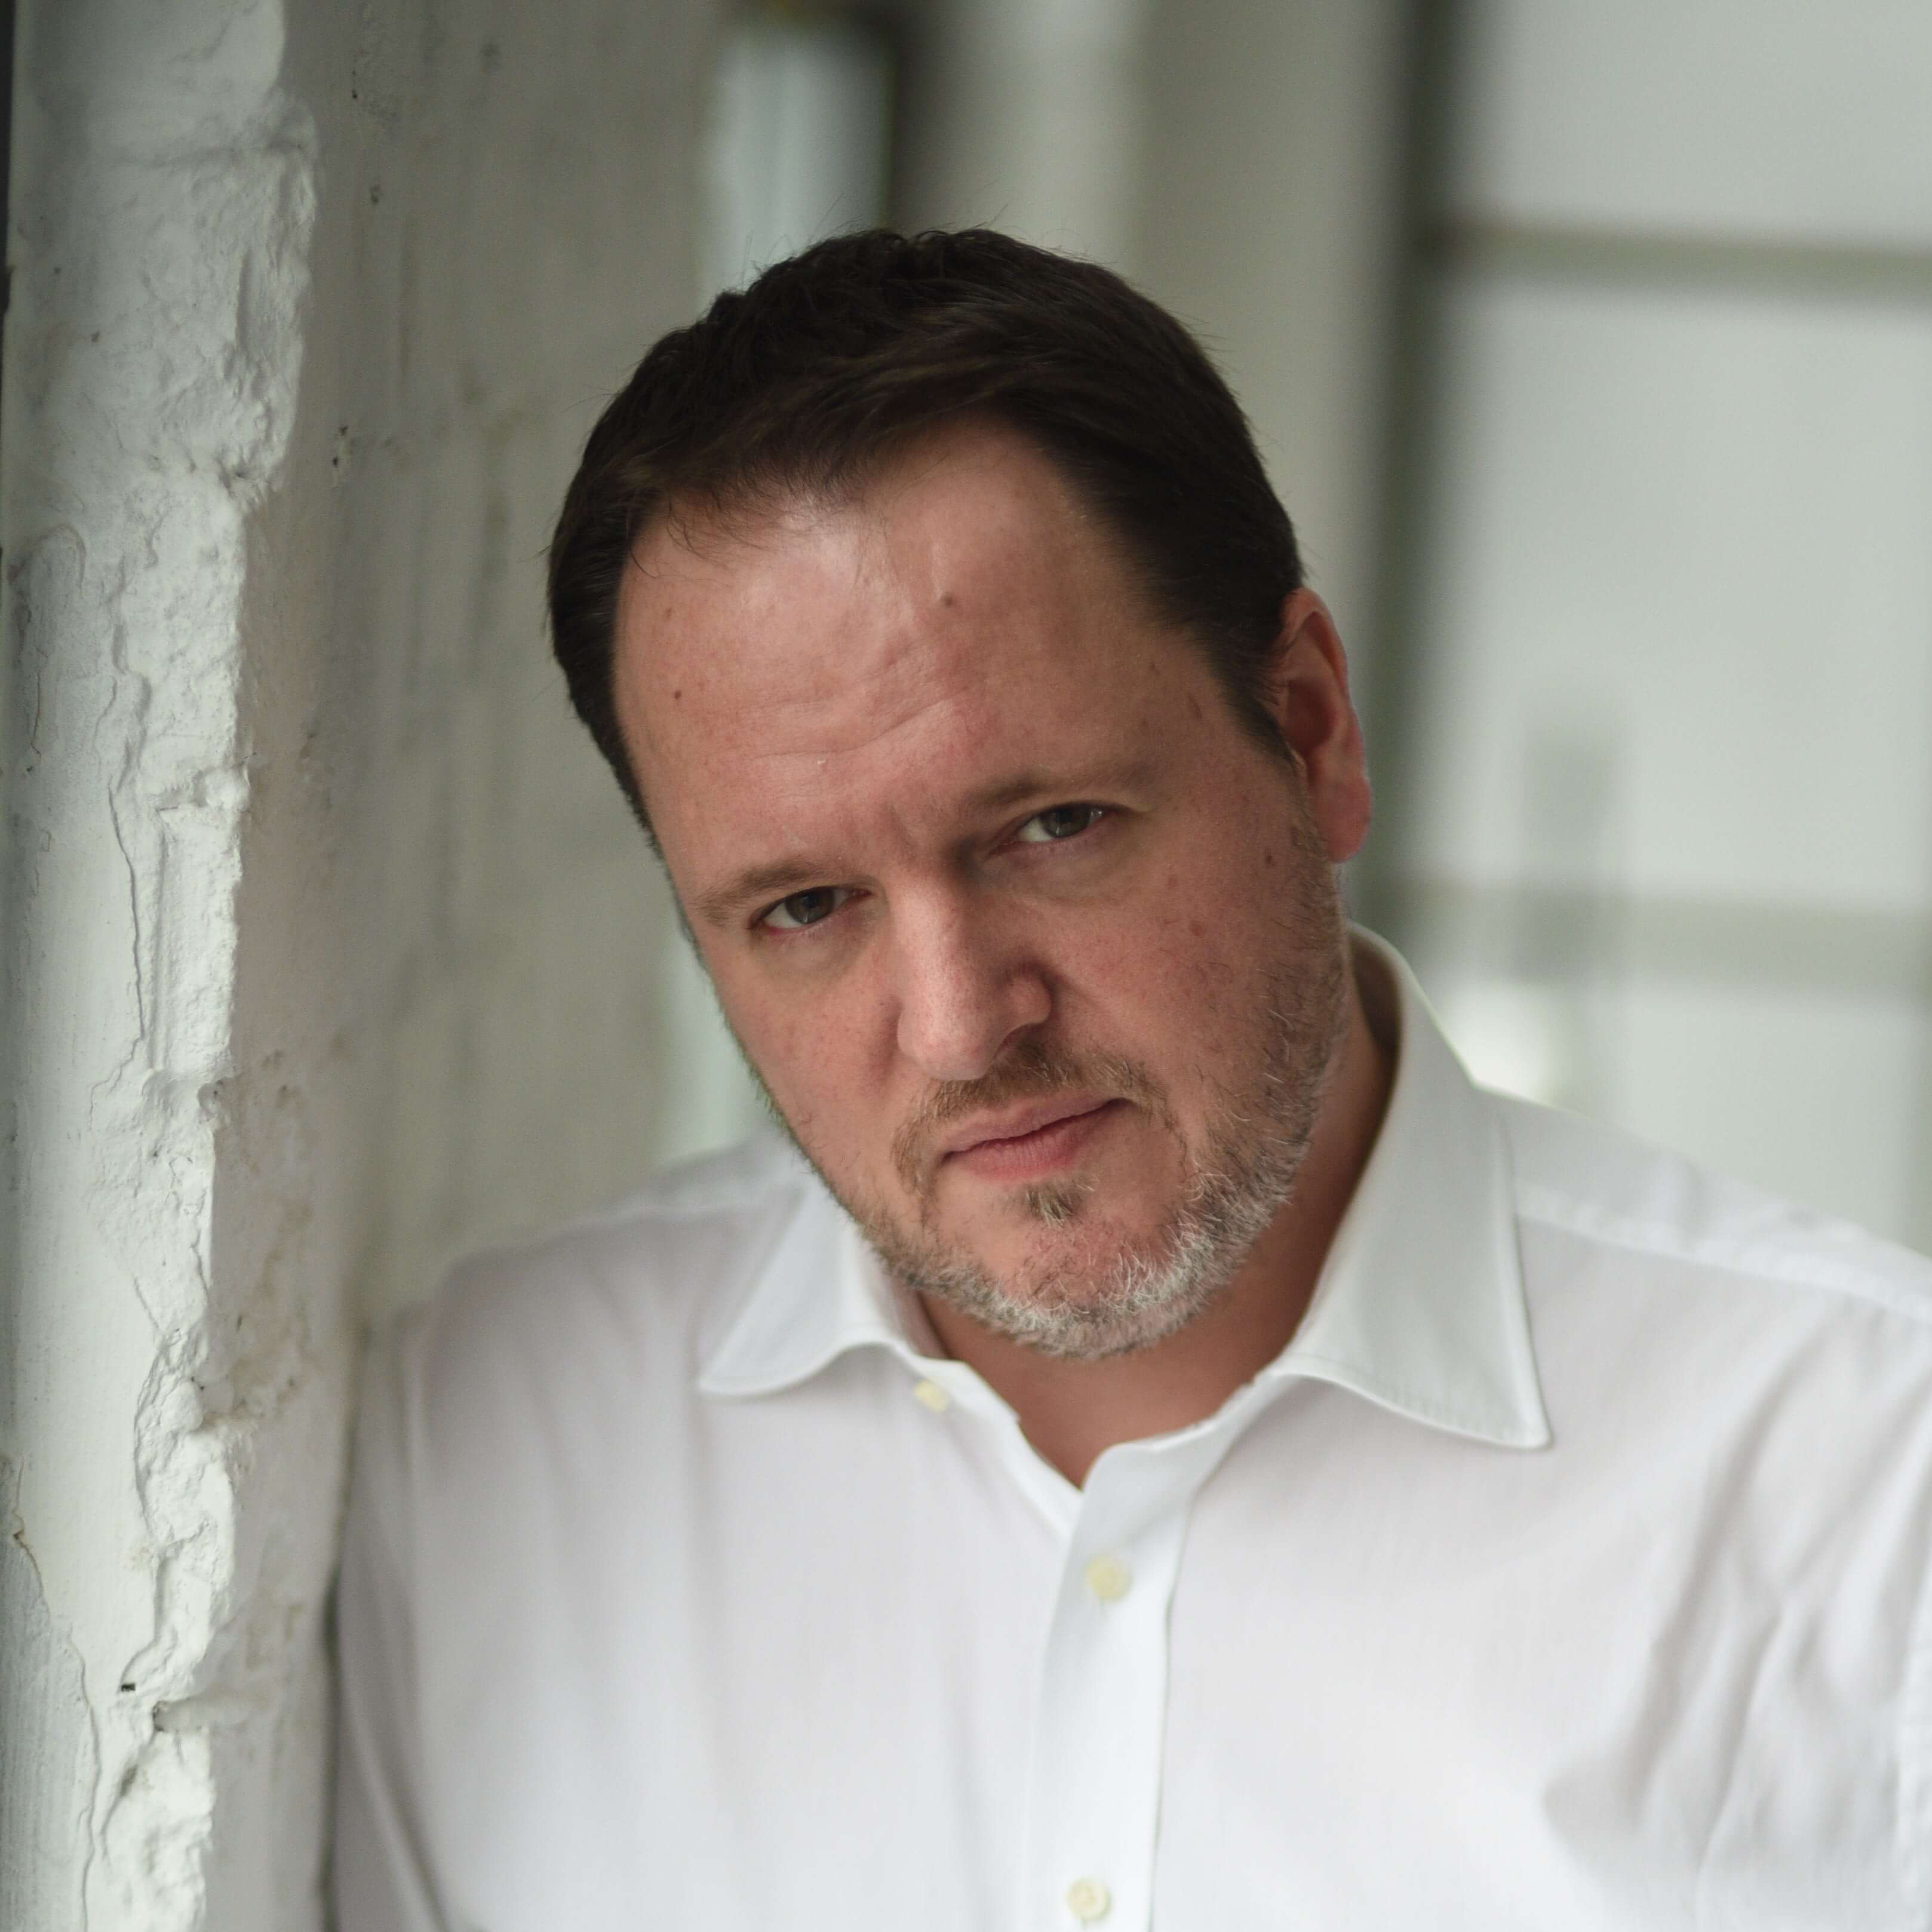 Dr Kádas Péter profilkép